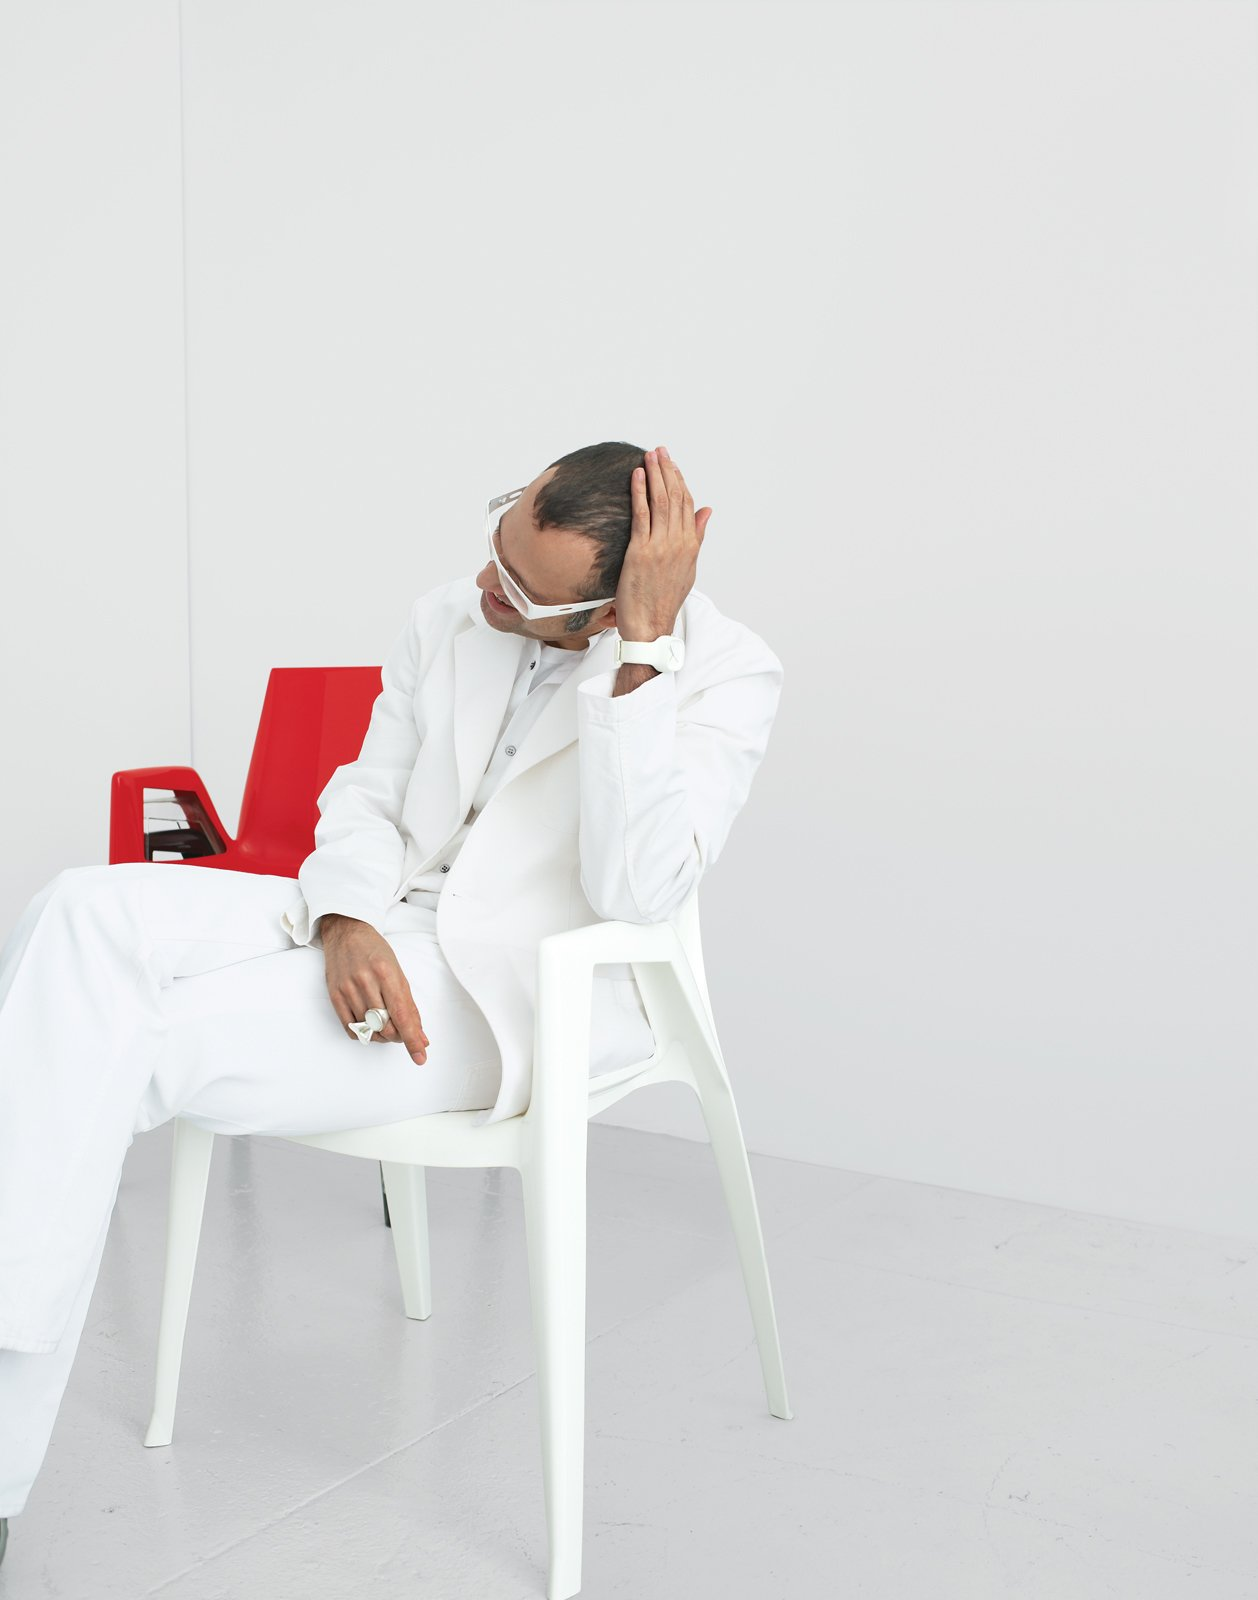 Photo 1 of 4 in Karim Rashid Picks the Top 4 Luxury Plastic Chairs